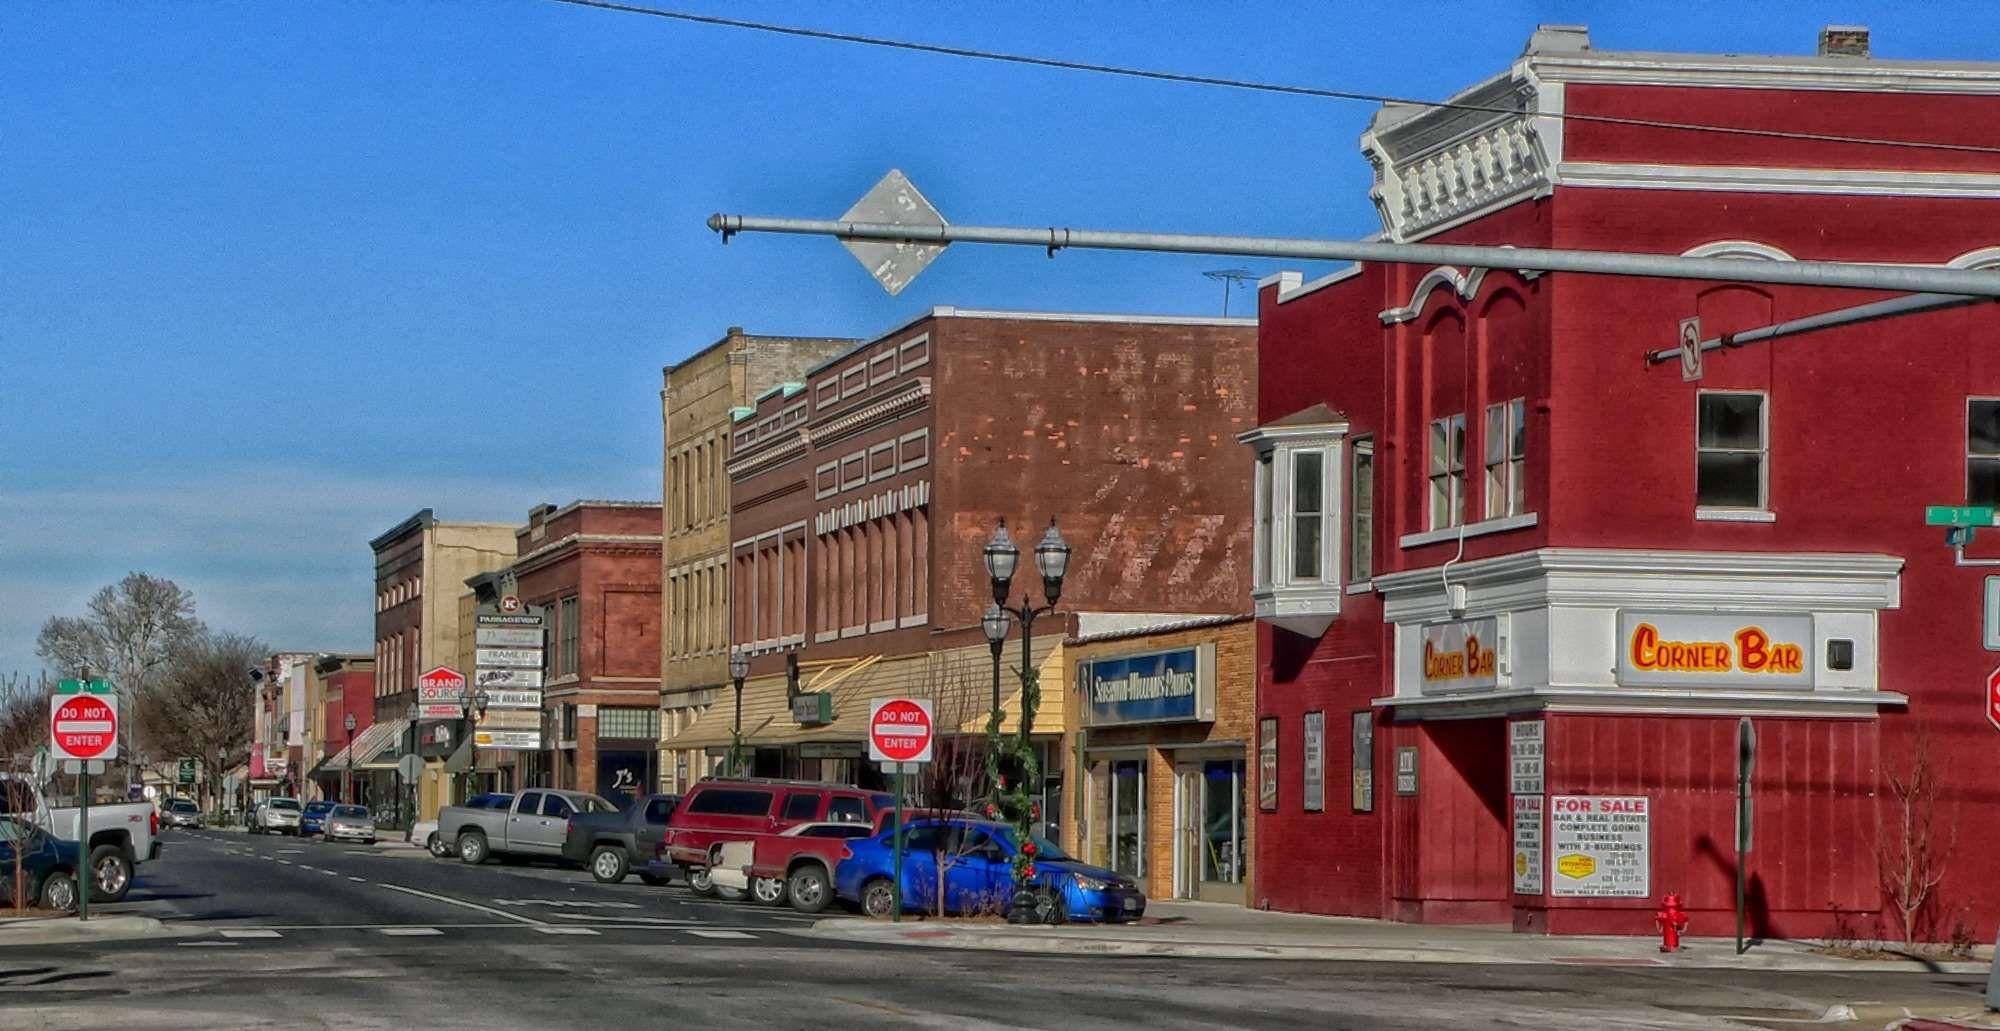 Bar Clouds Fremont Hdr Nebraska Pub Shops Sky Stores Street Town Urban Vehicles